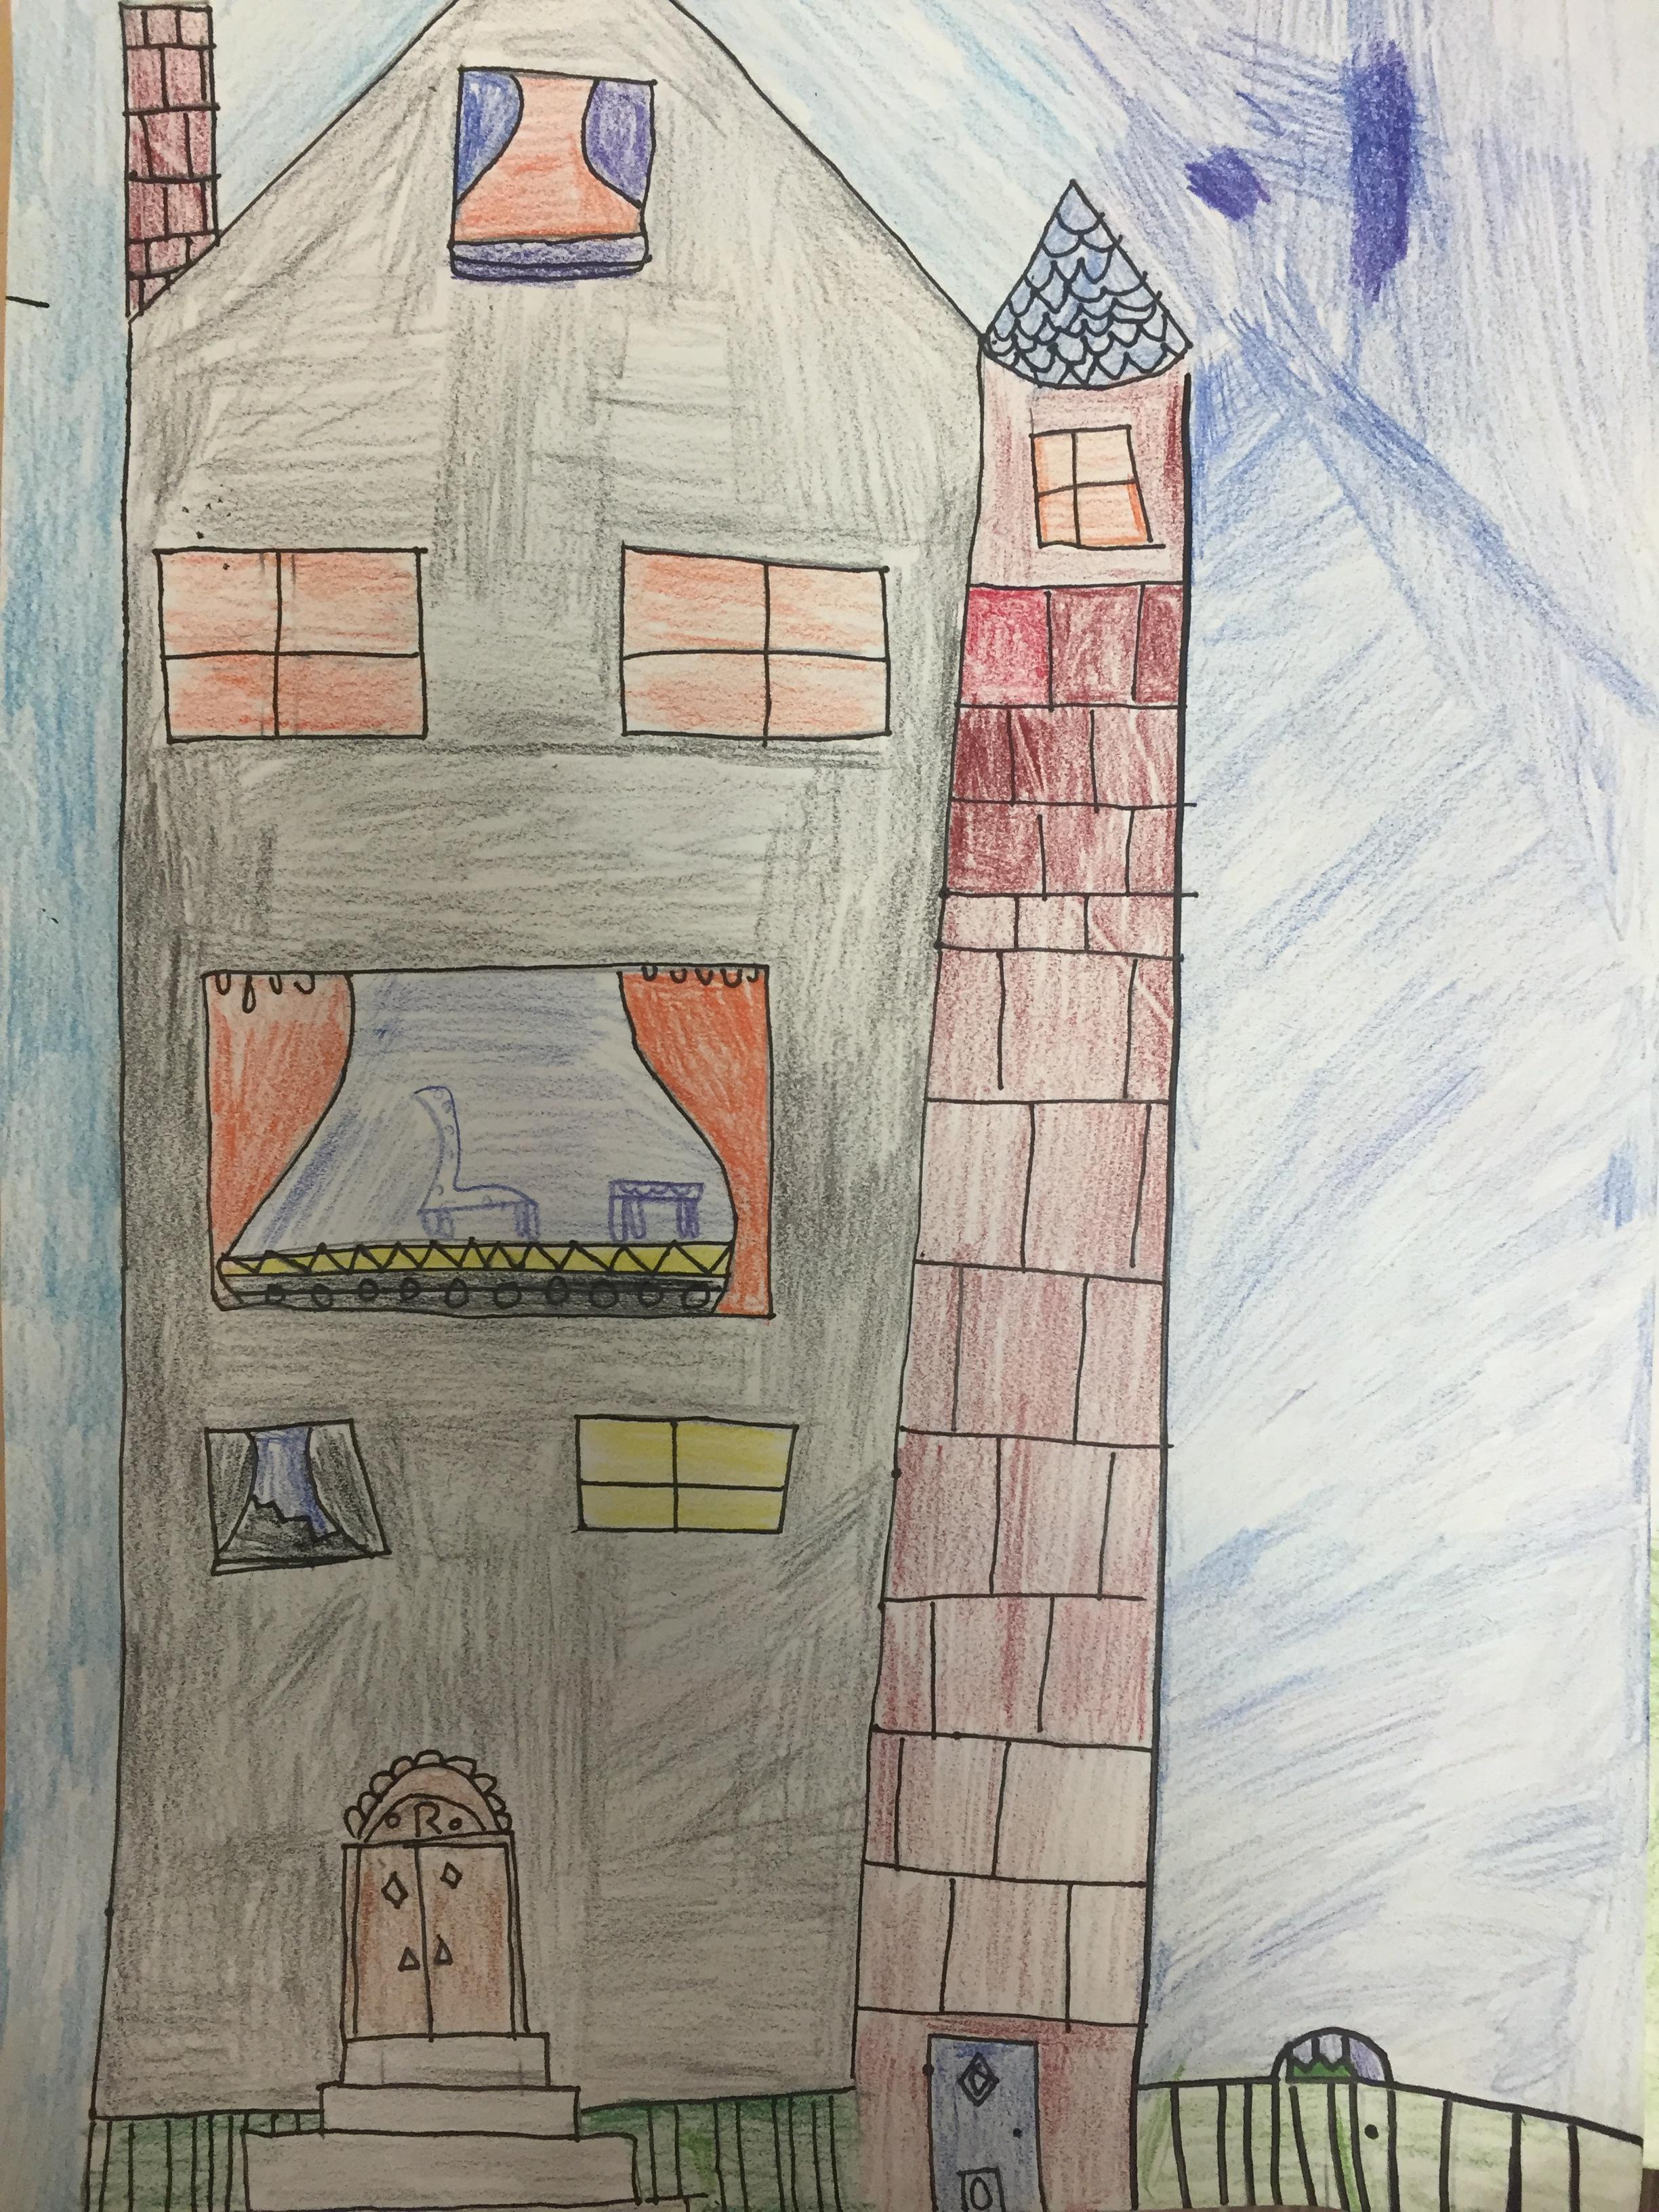 Christian R., 4th Grade, Mr. Crossman's Class